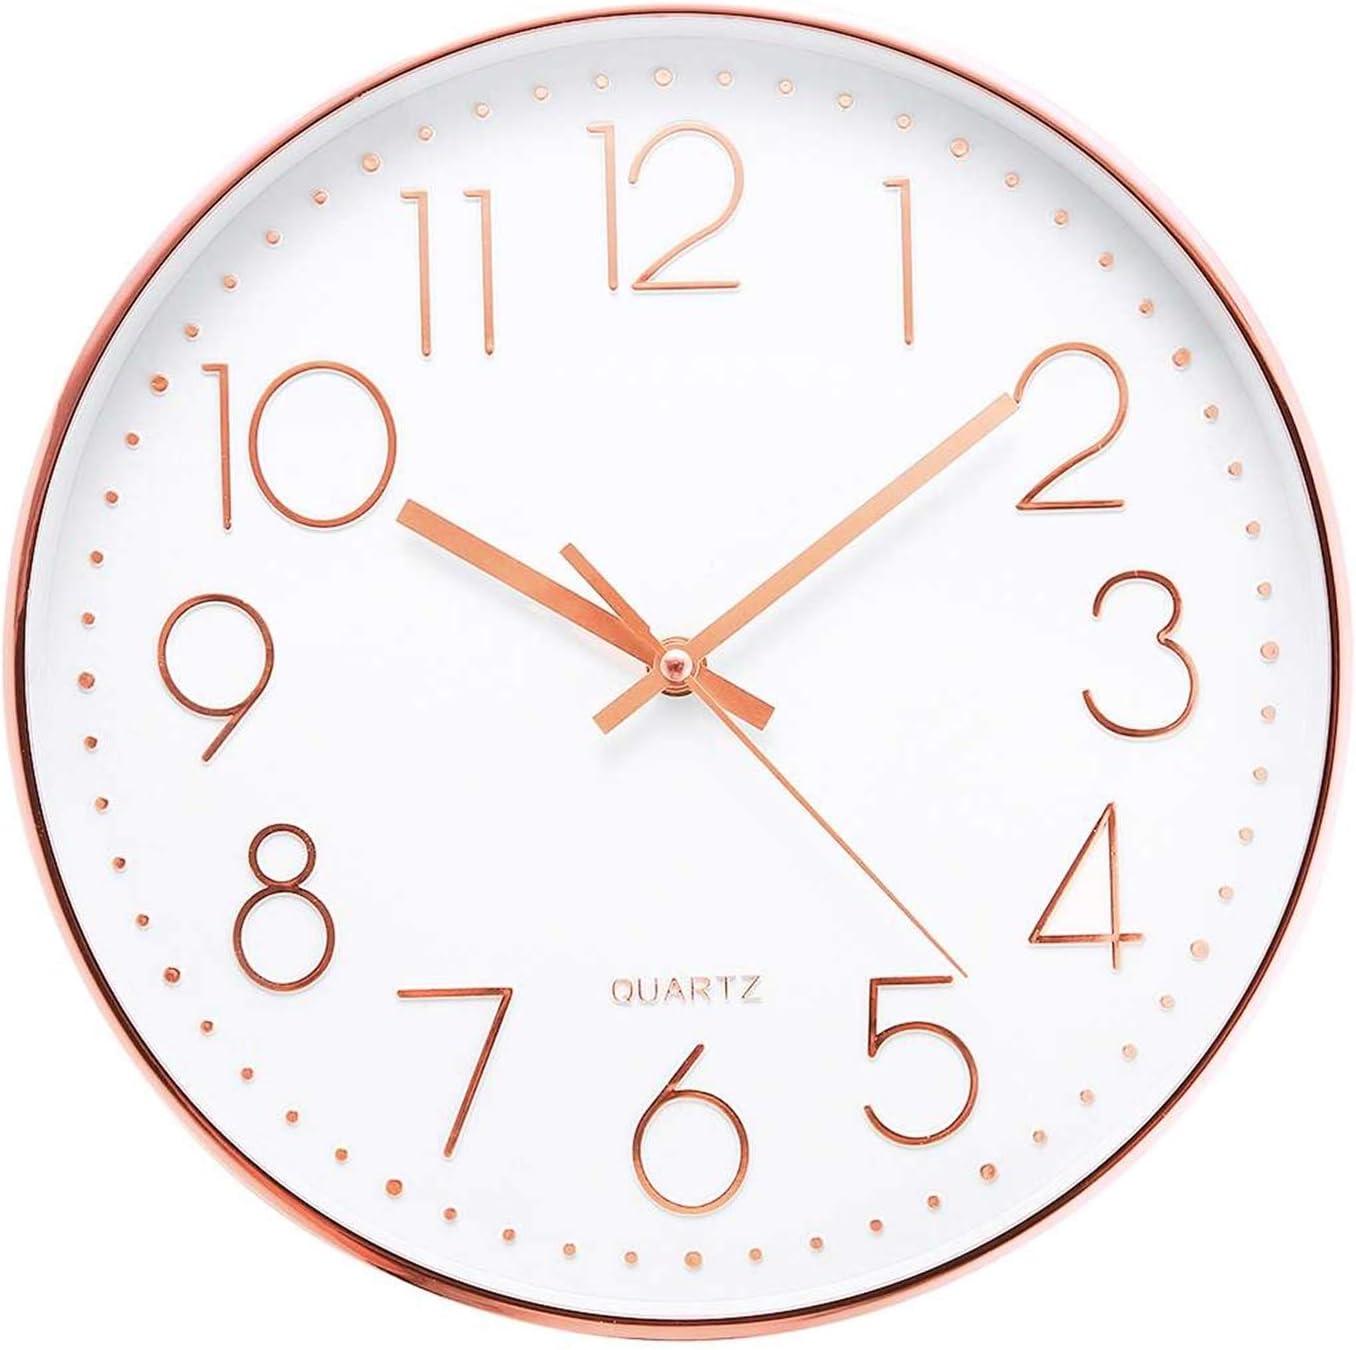 Rcsinway 12 inch Limited time cheap sale Rose Gold Silen Super-cheap Clock Non-Ticking Luminous Wall